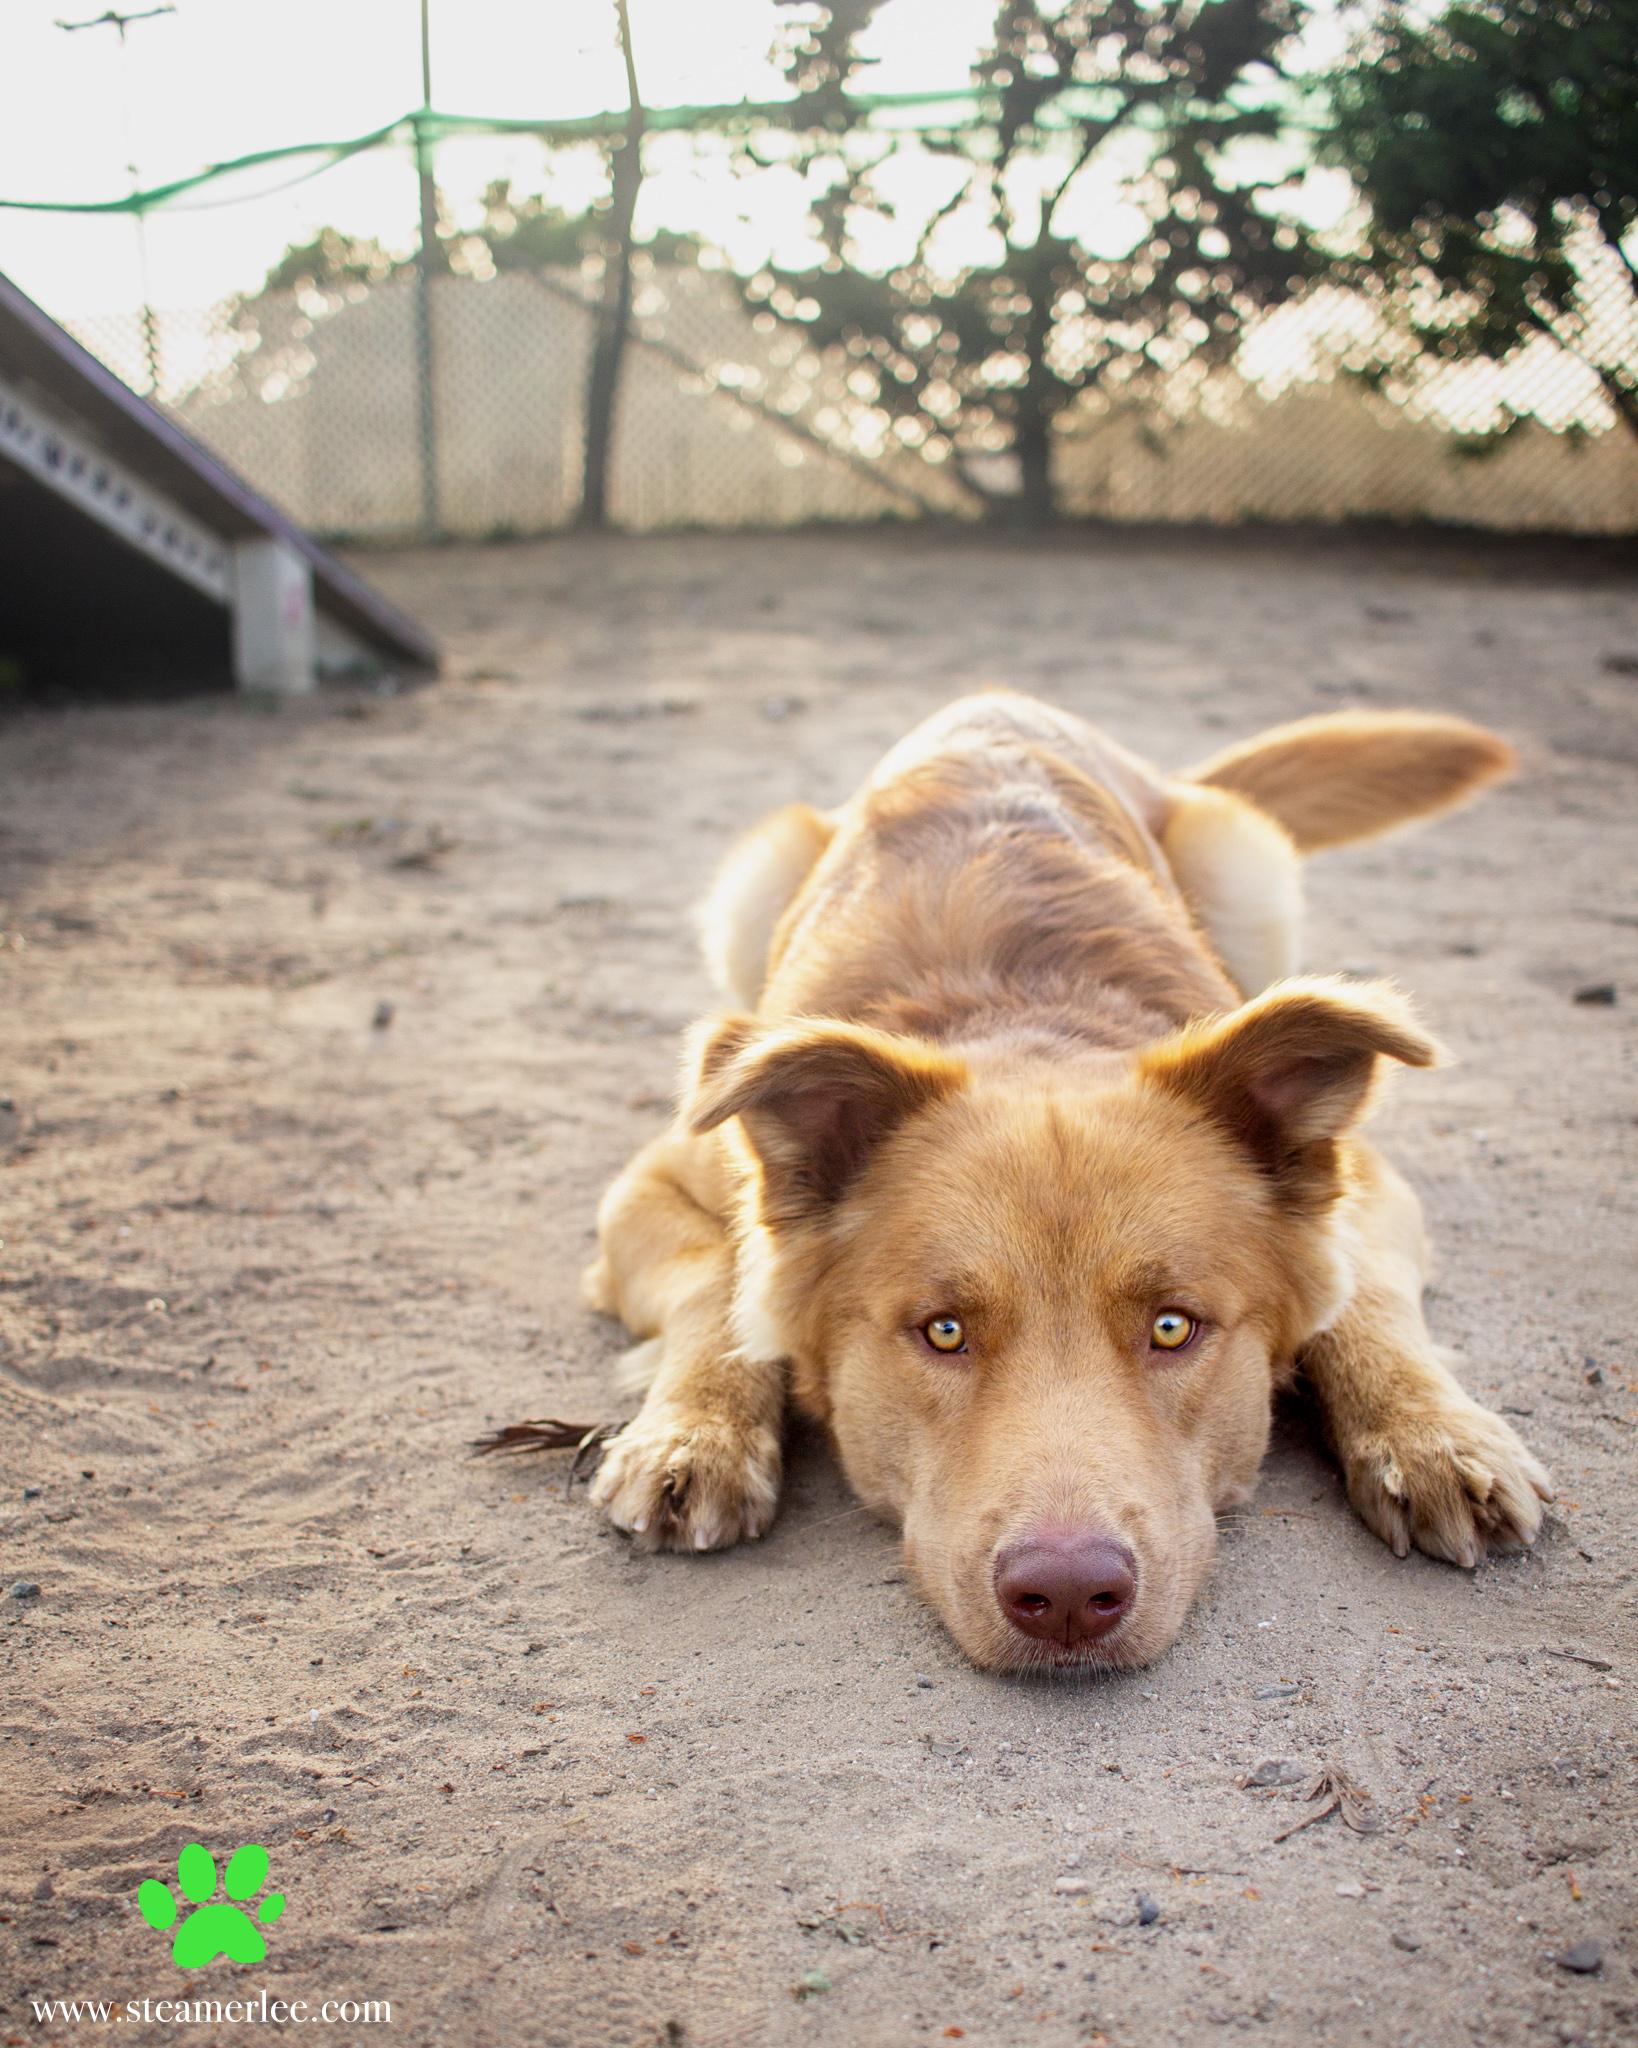 317-Orange-County-Dog-Photography-Steamer-Lee-Southern-California-SBACC.JPG